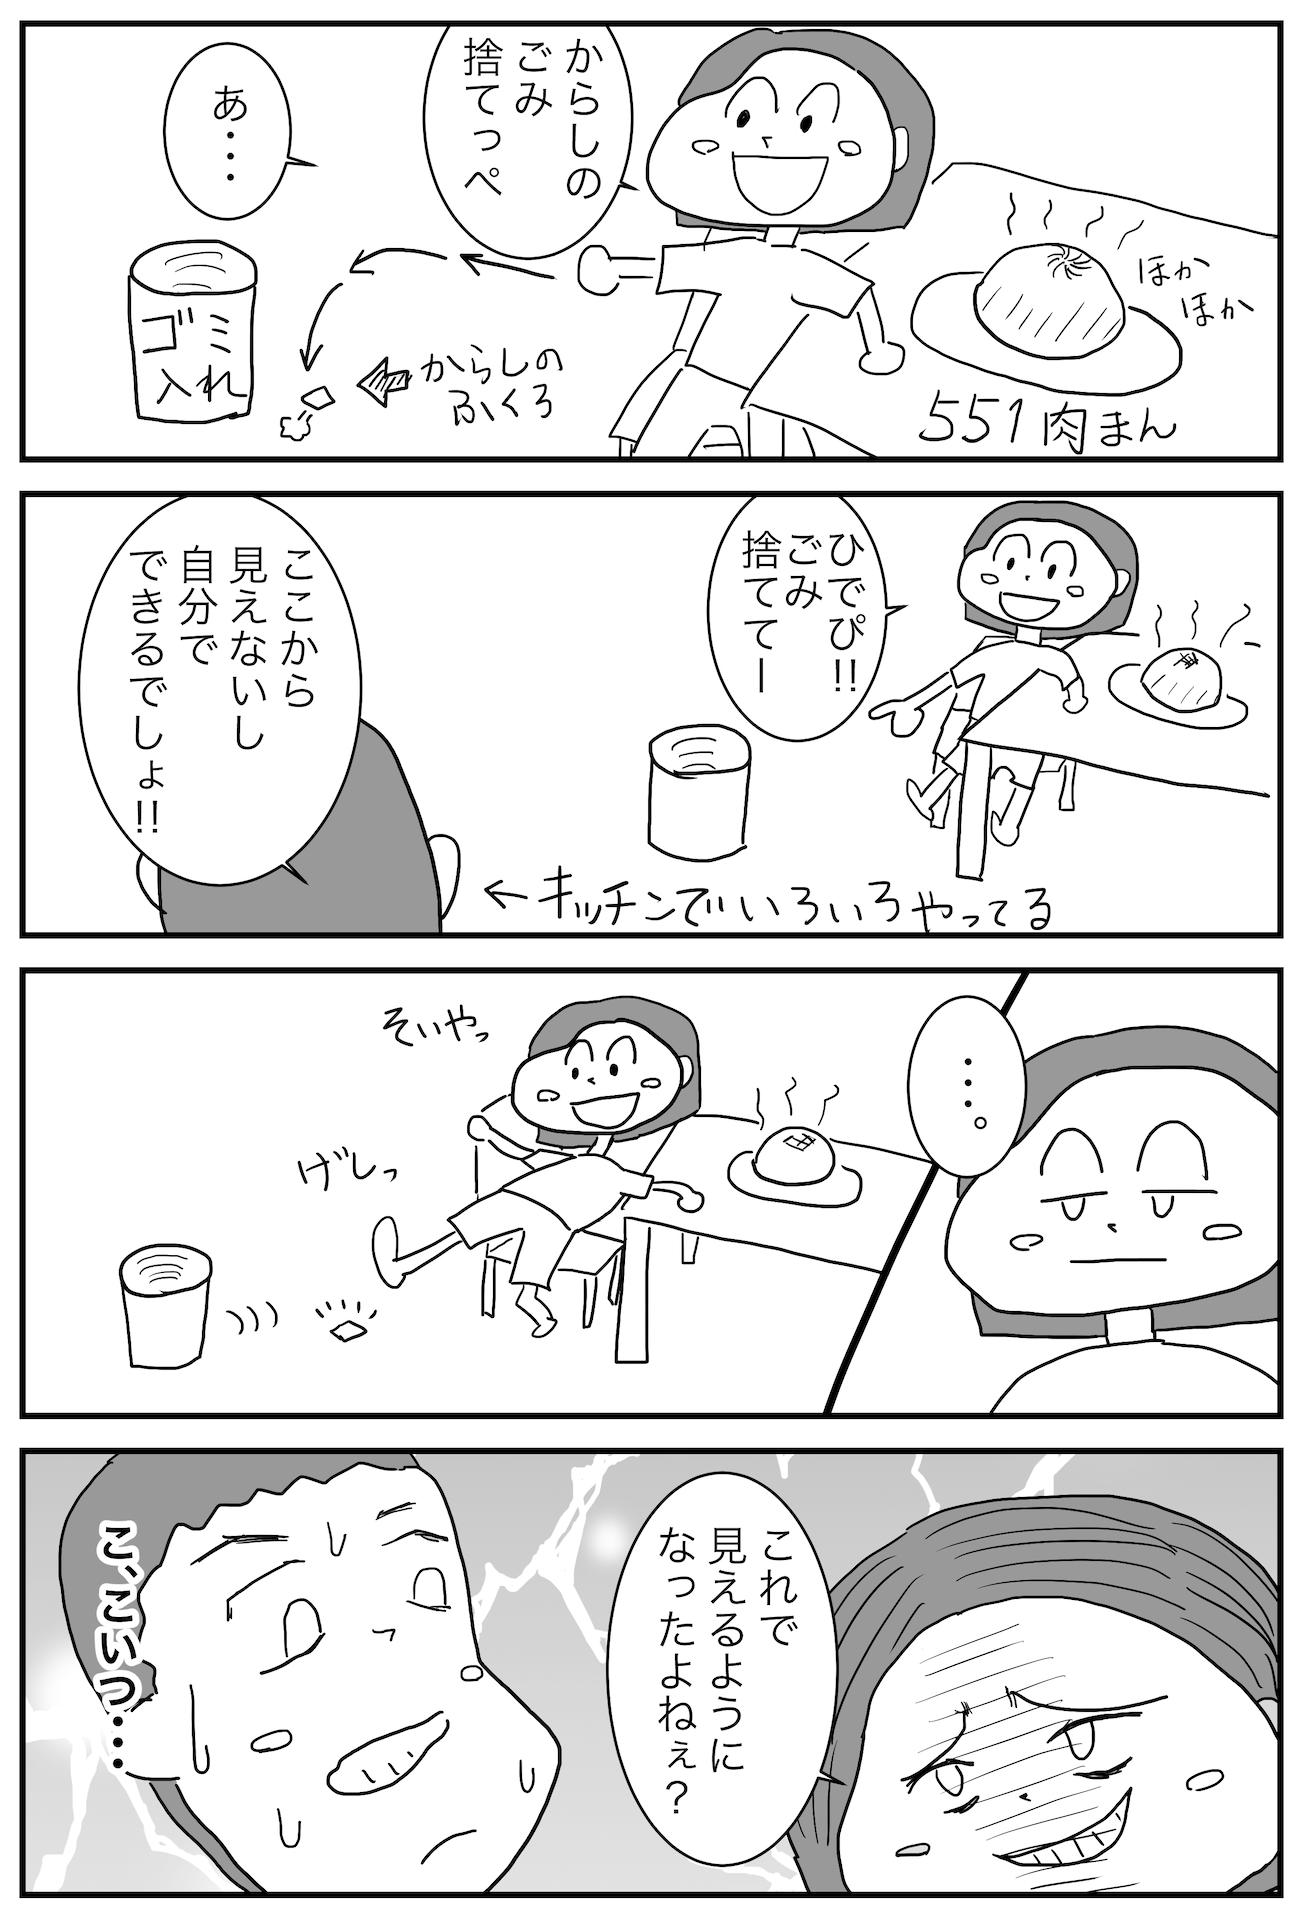 manga-kick-trash-can